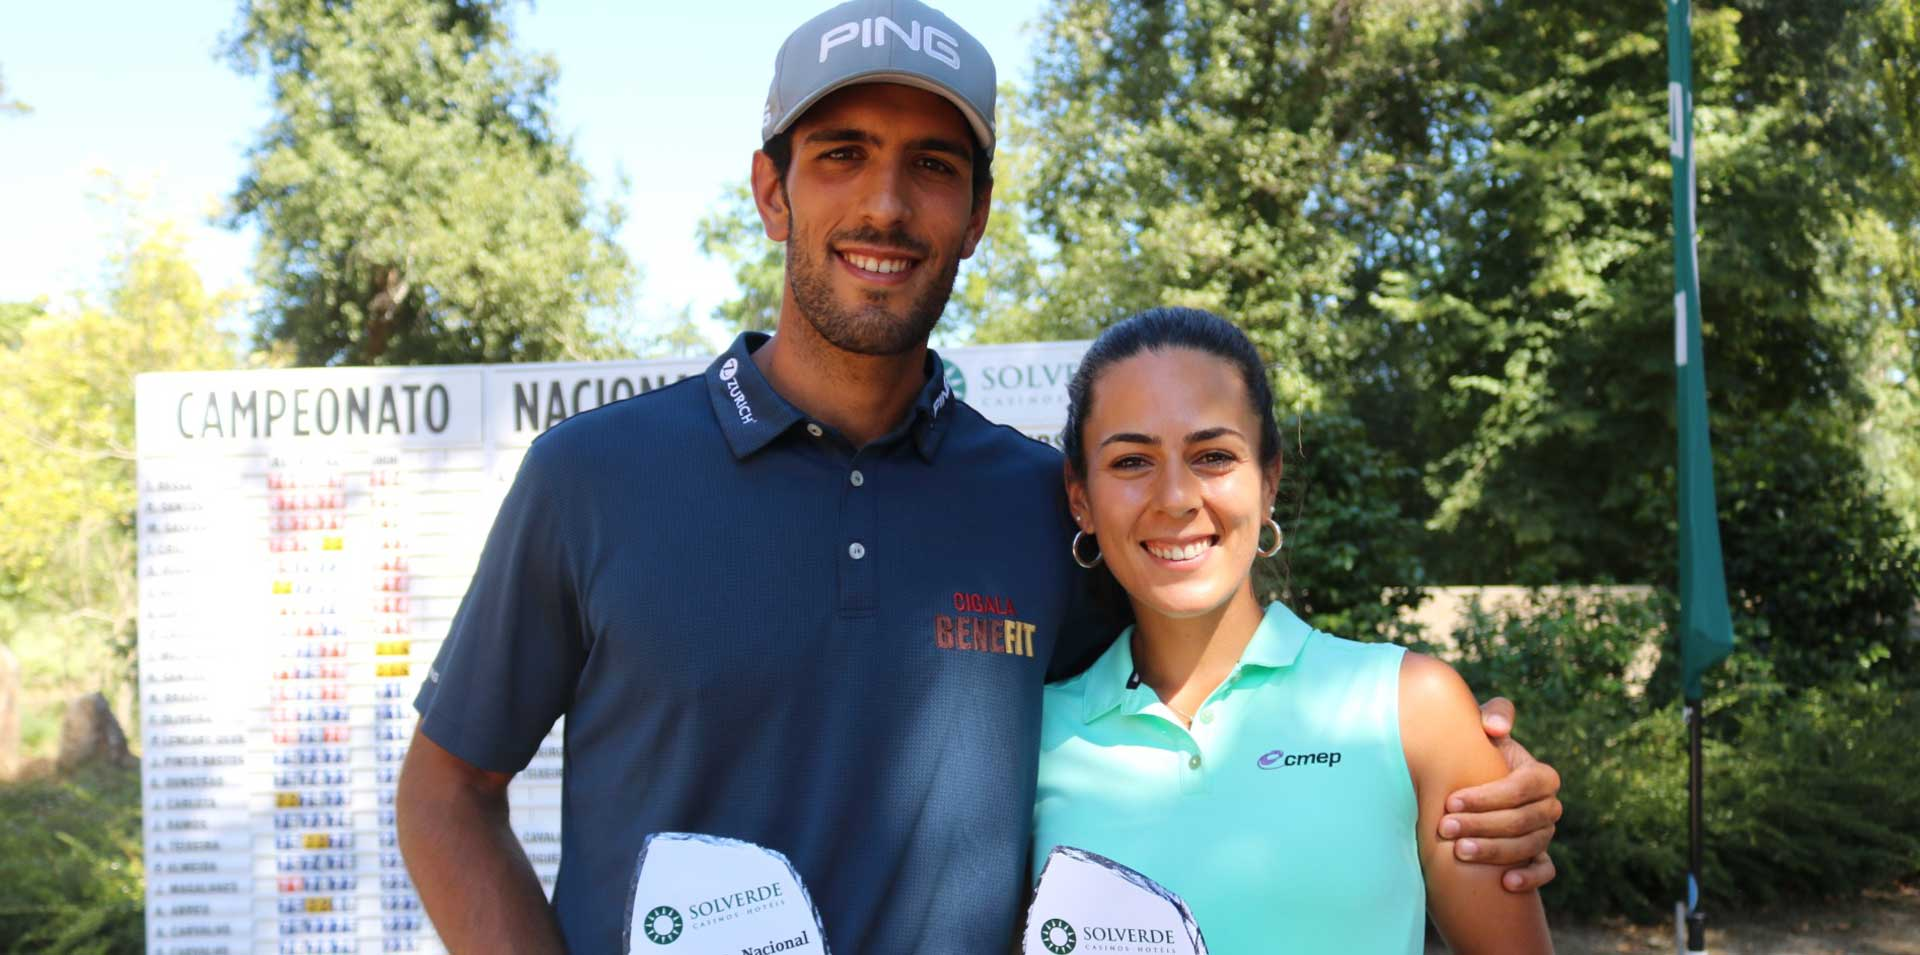 Parabéns aos Campeões Nacionais Leonor e Tomás Bessa